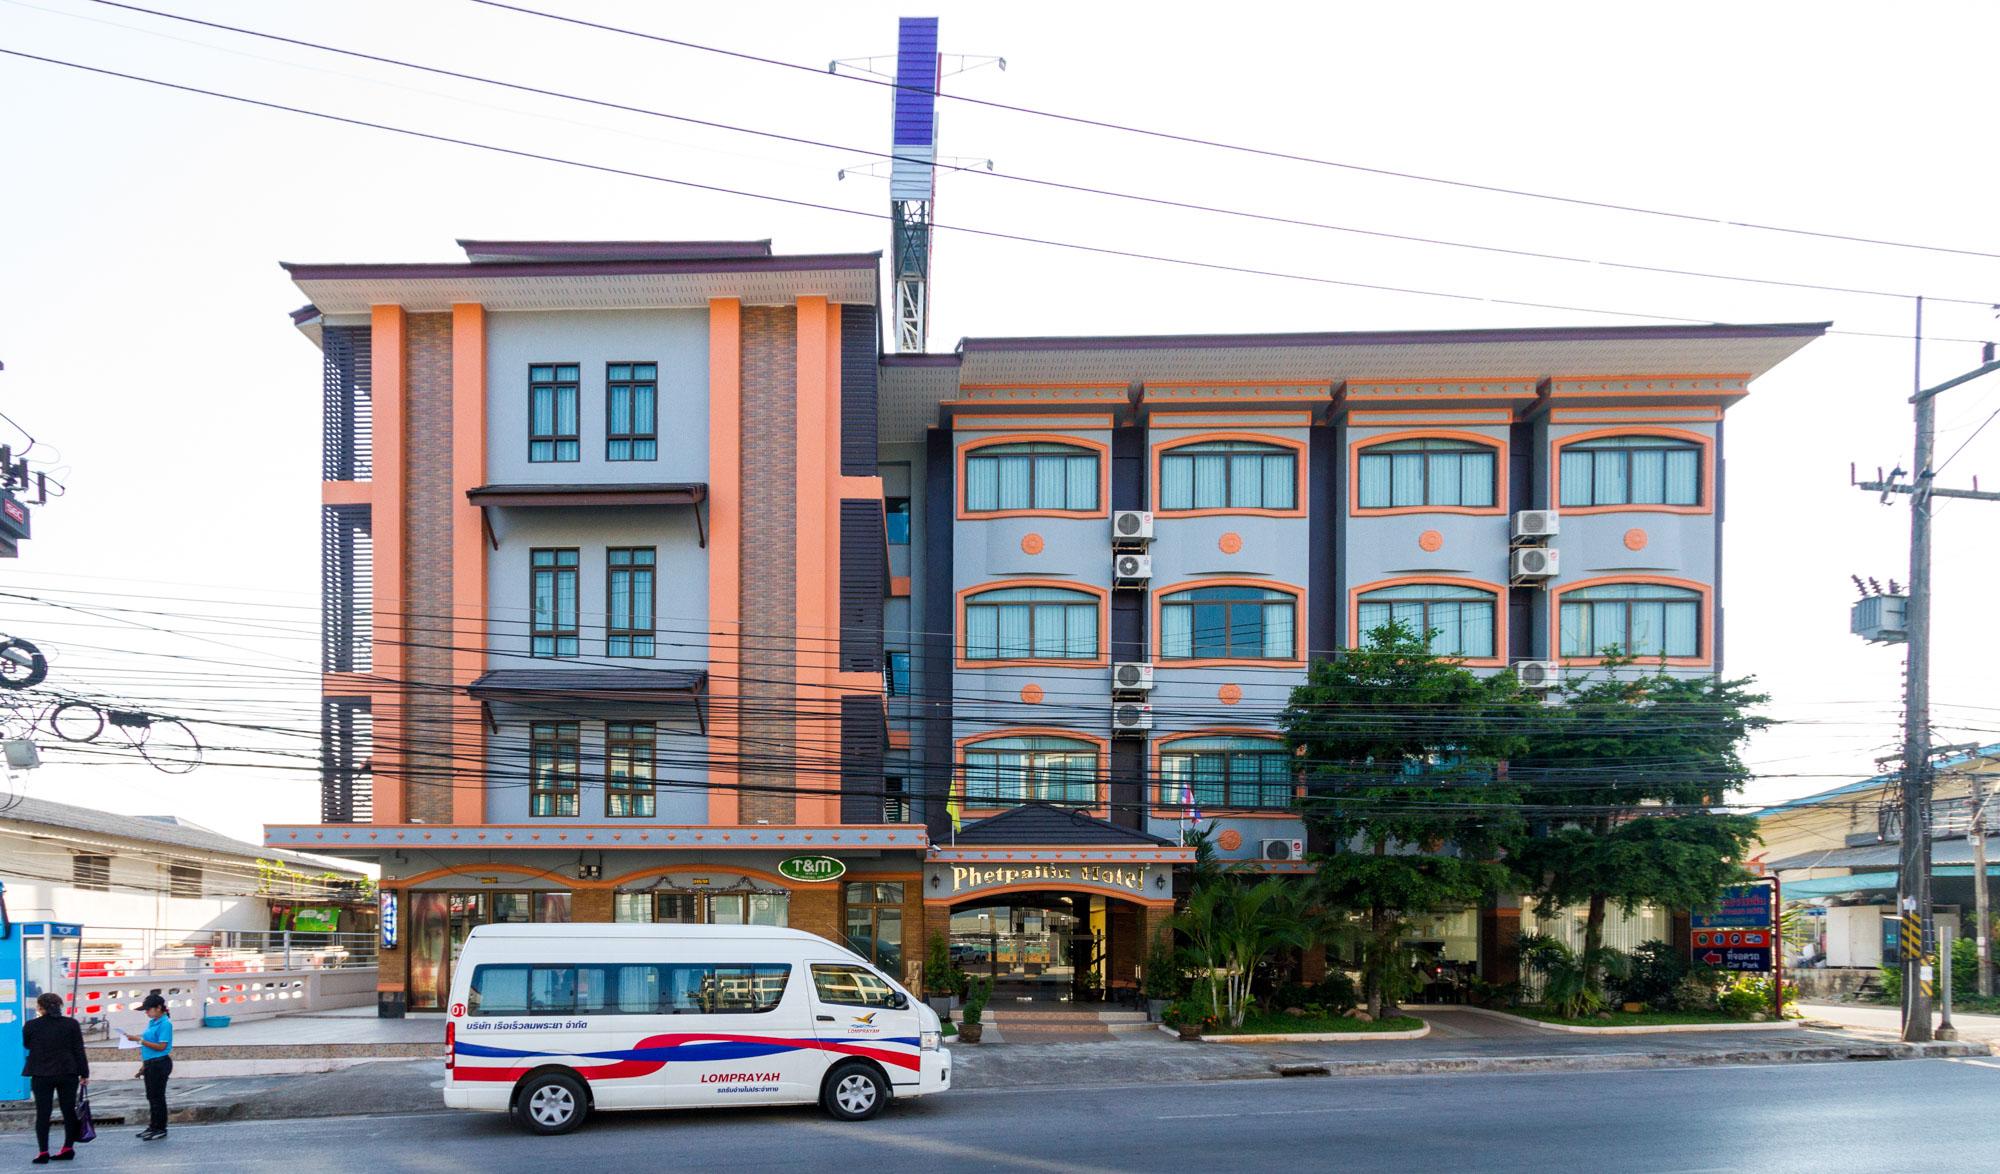 Krabi Phetpailin Hotel Halal in Krabi  โรงแรมกระบี่เพชรไพลิน โฮเทล (Krabi Phetpailin Hotel) Halal IMG 0211